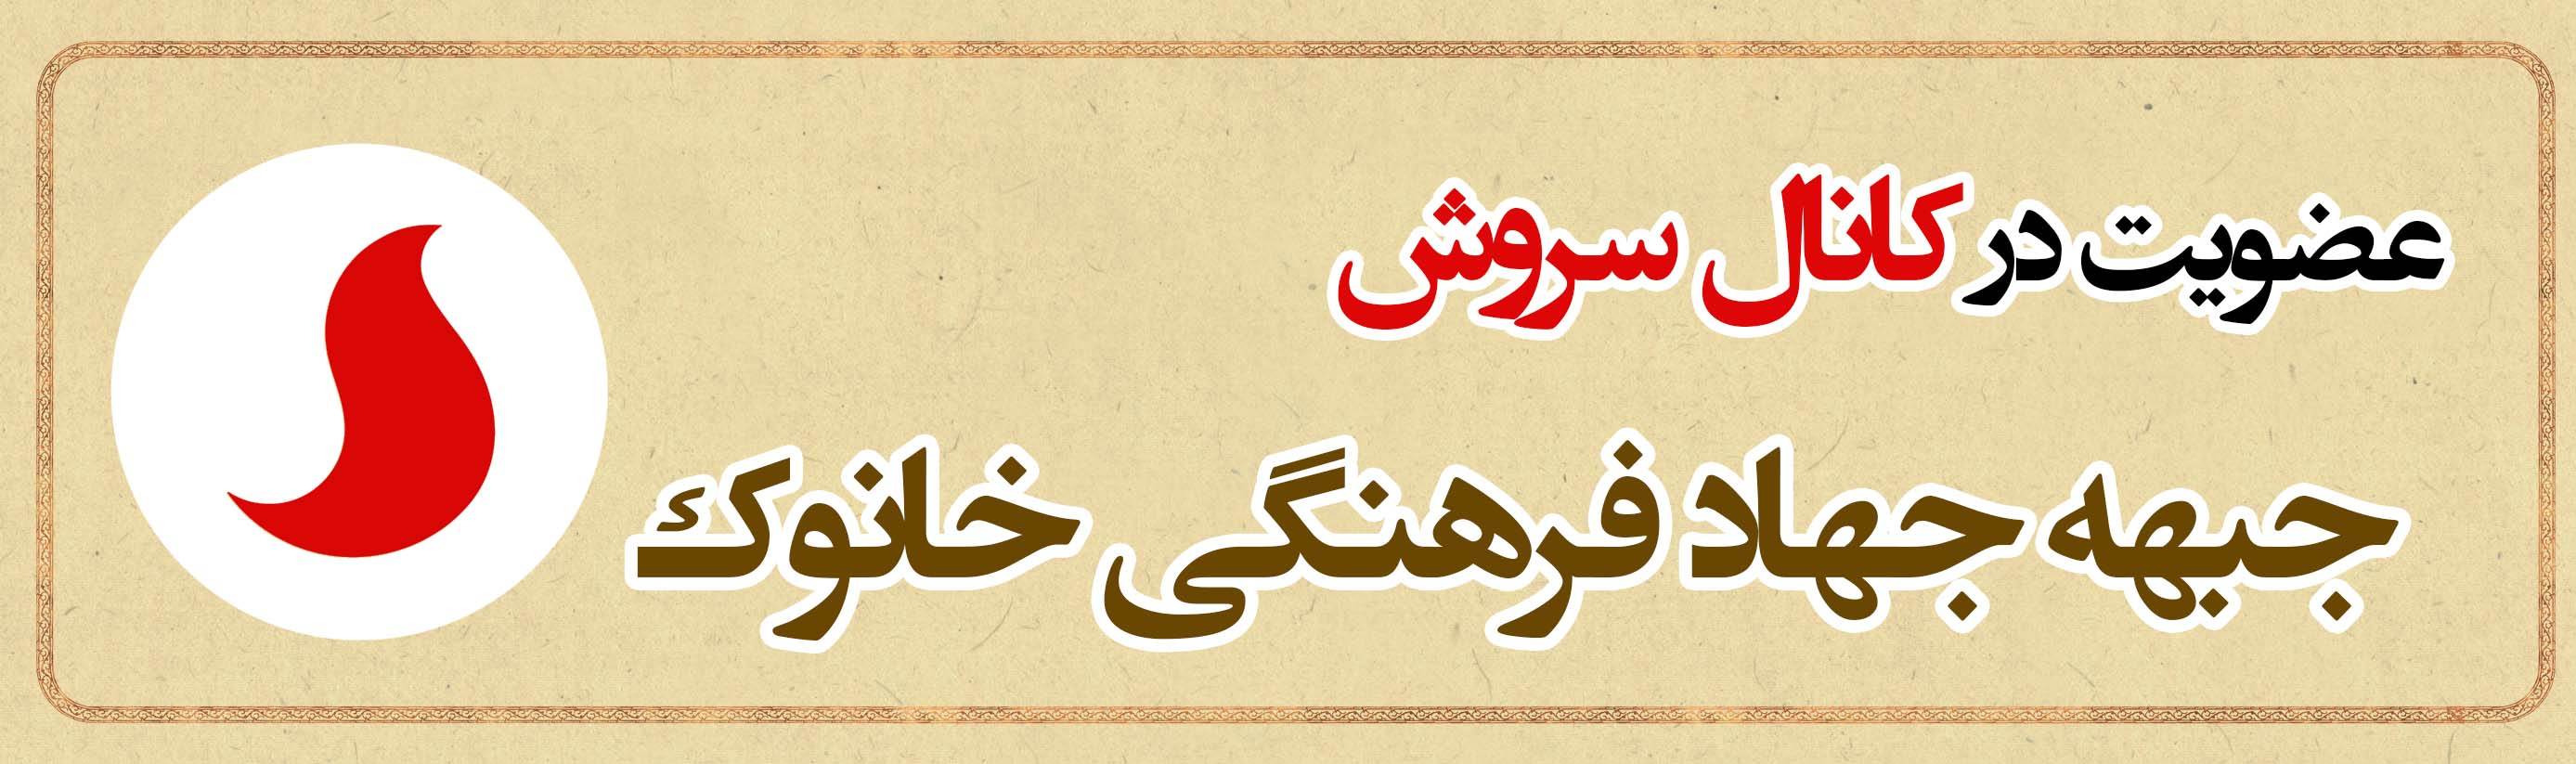 عضویت درکانال سروش    جبهه جهاد فرهنگی خانوک